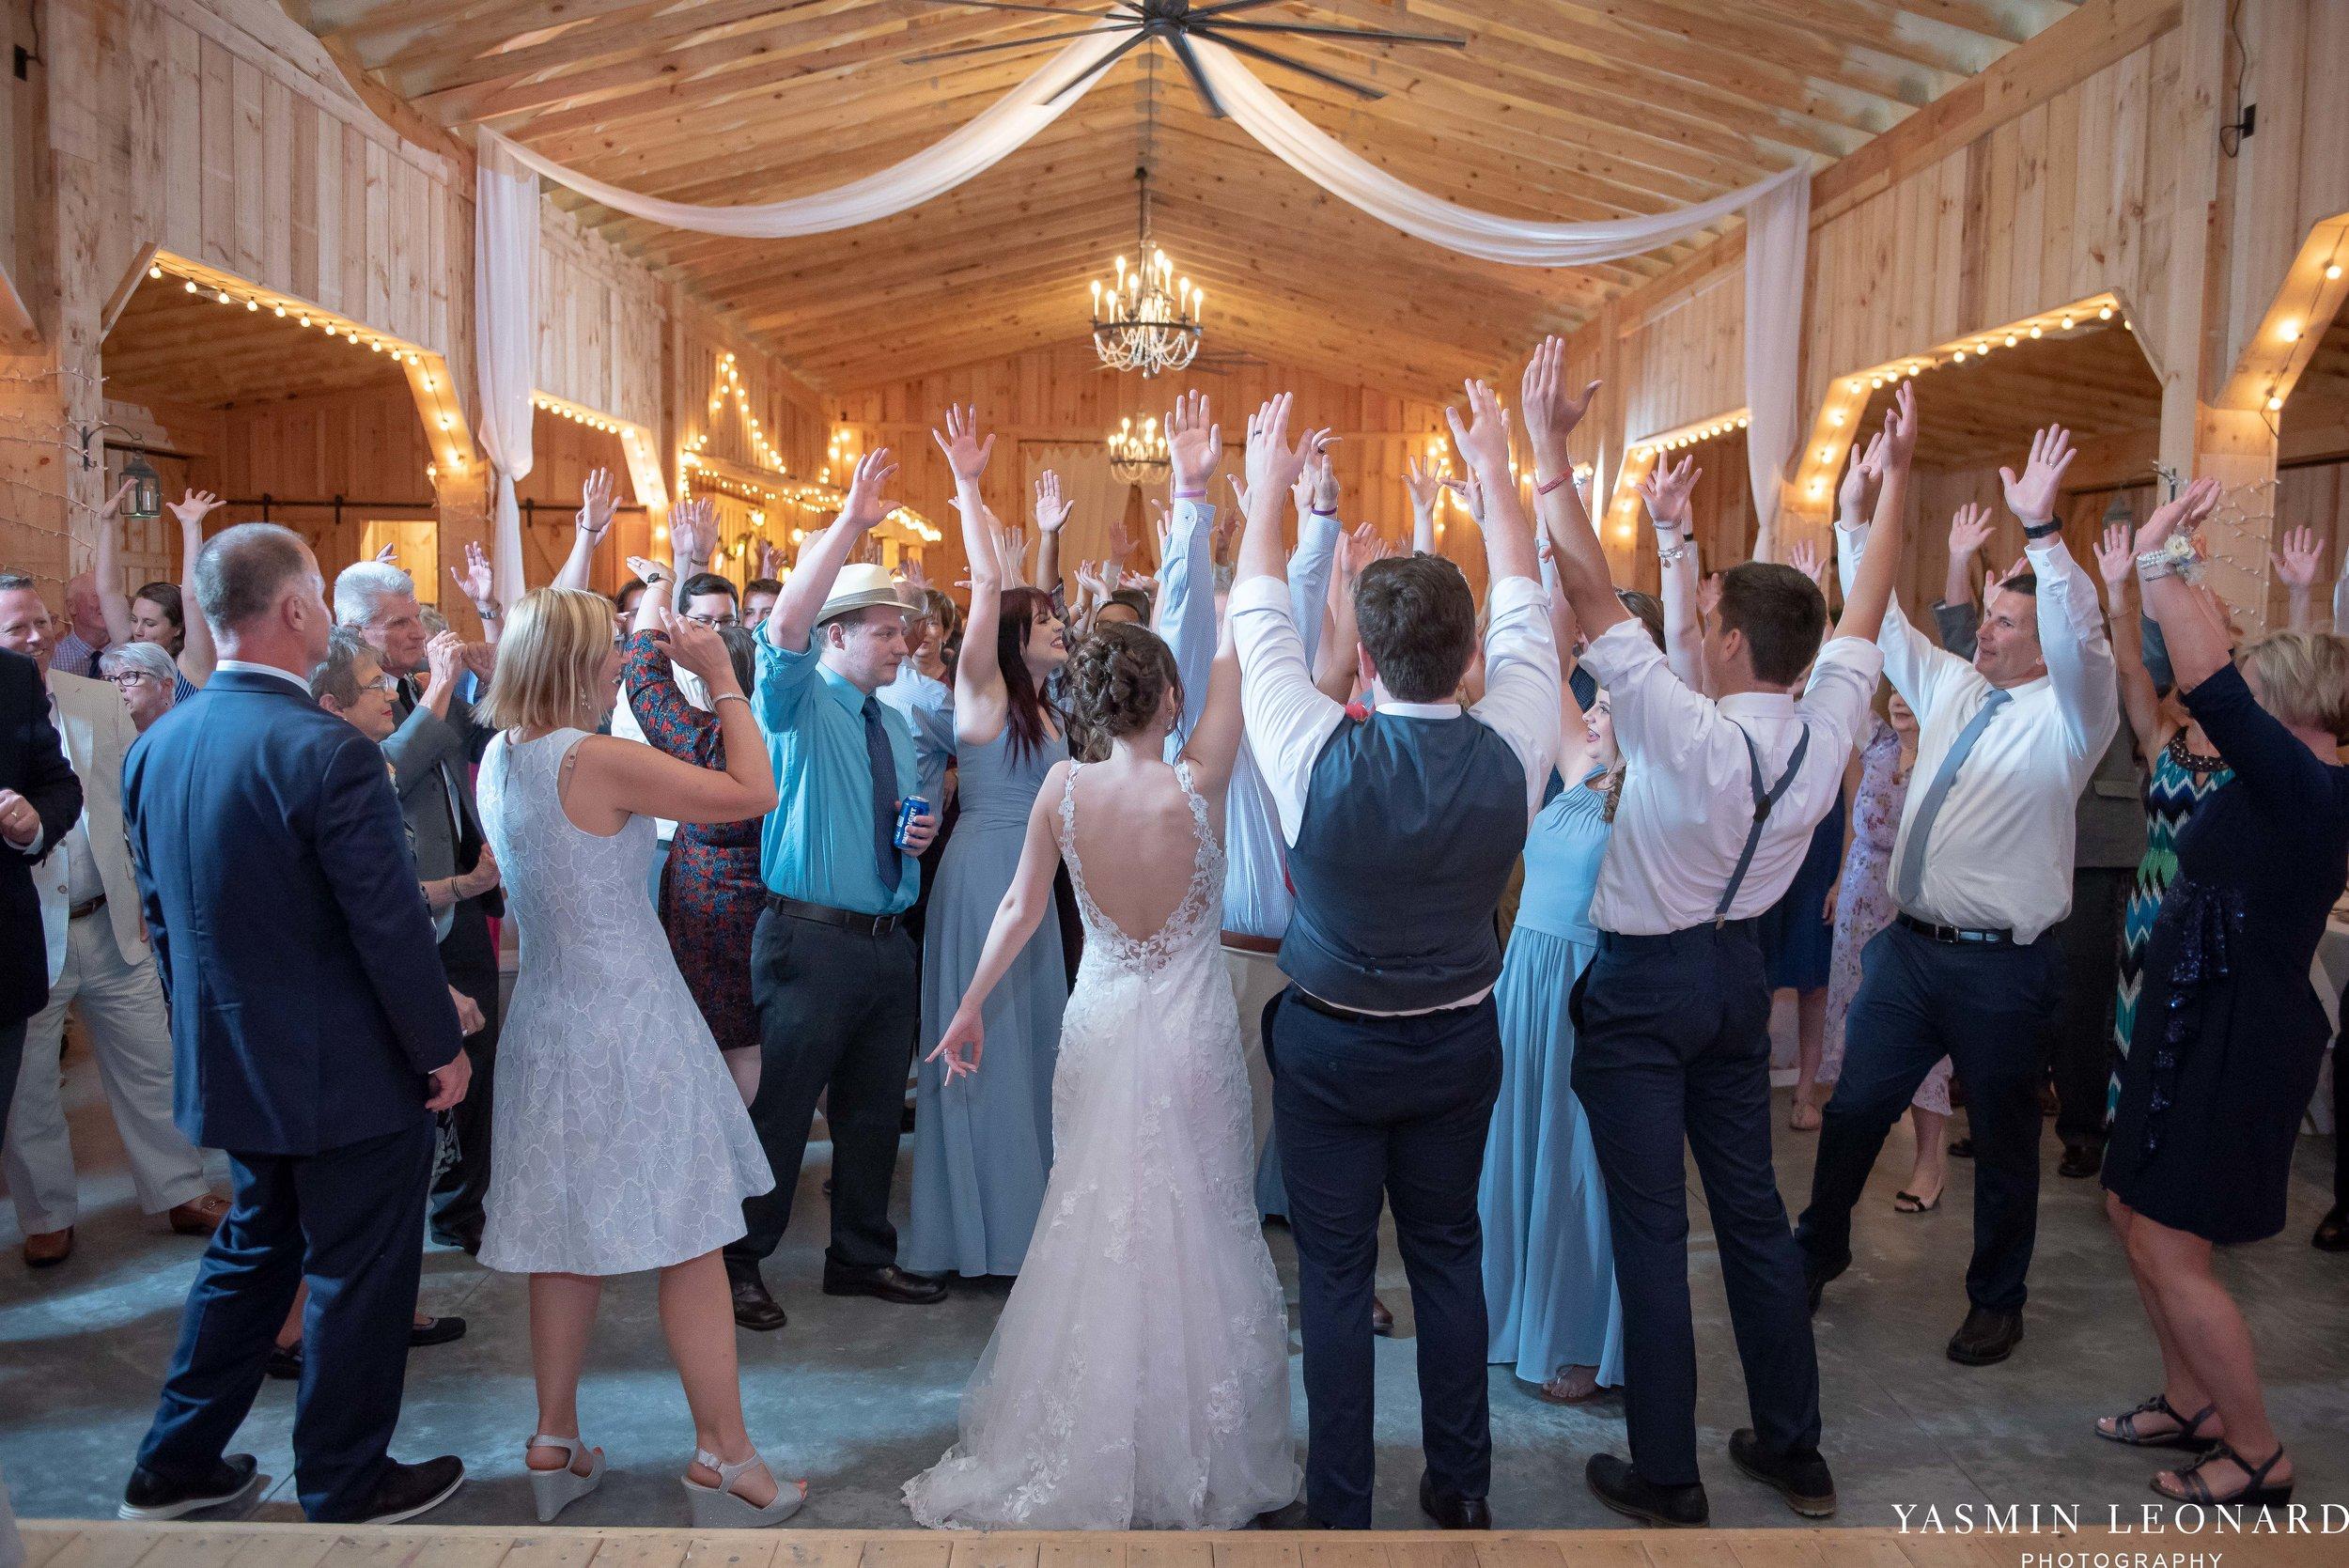 Old Homeplace Vineyard - NC Weddings - Outdoor Summer Weddings - Peony Boutique - Vineyard Wedding - NC Photographer - Yasmin Leonard Photography-74.jpg